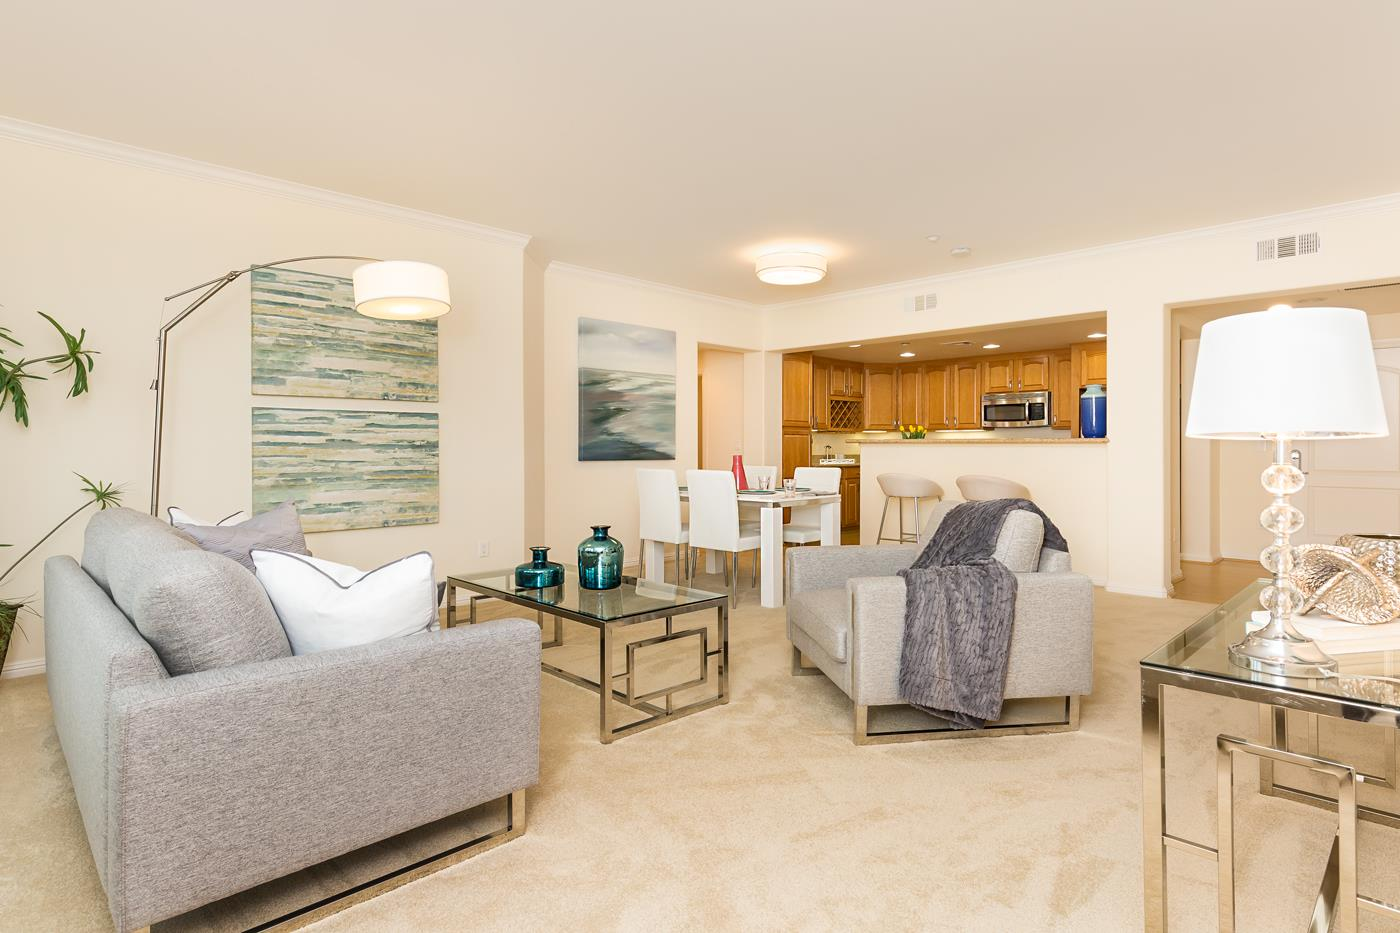 شقة بعمارة للـ Sale في 2250 Gellert Boulevard 2250 Gellert Boulevard South San Francisco, California 94080 United States